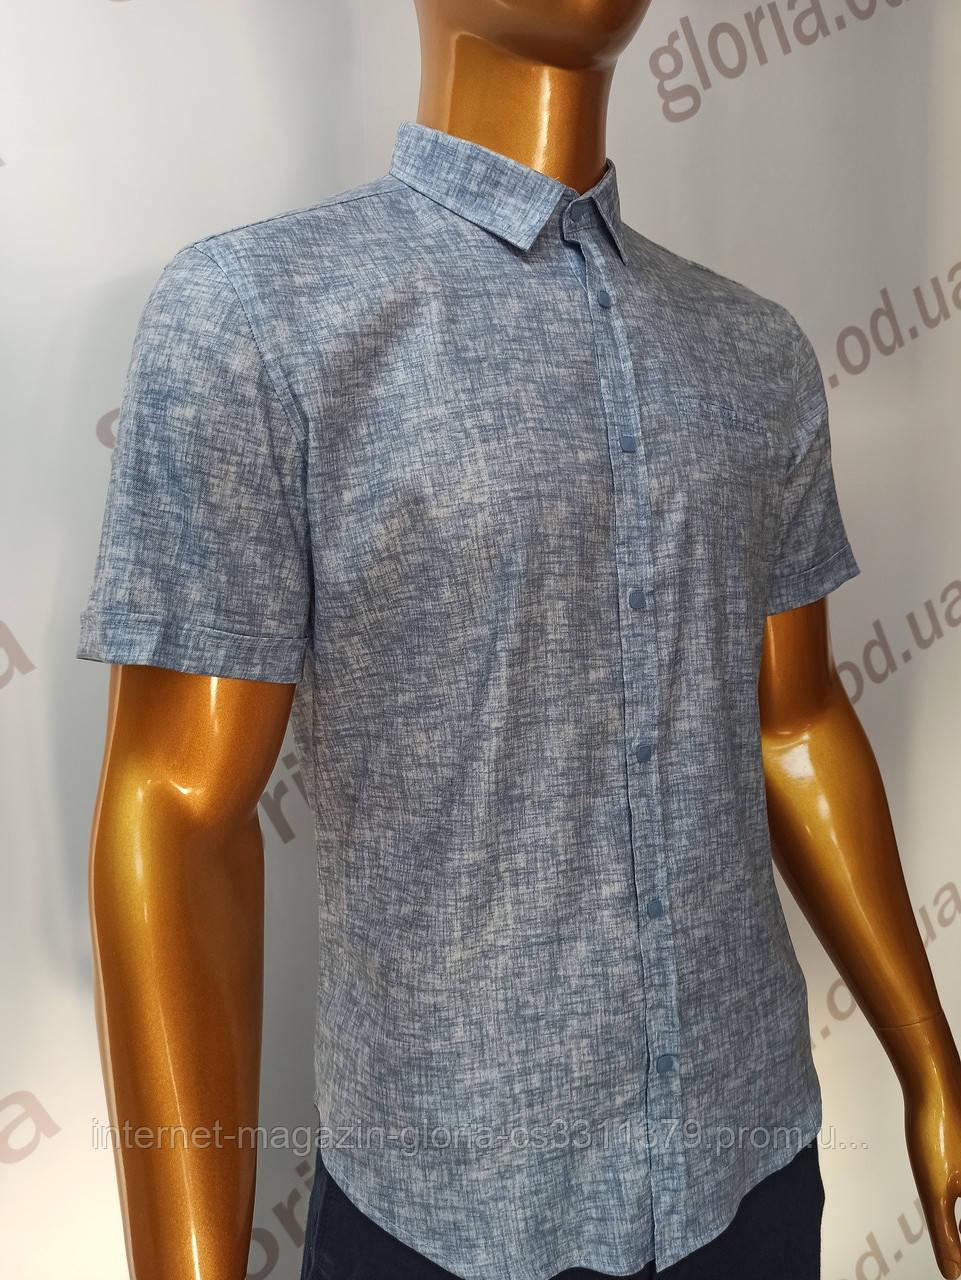 Мужская рубашка Amato. AG.19913(s). Размеры:L,XL(2), XXL.